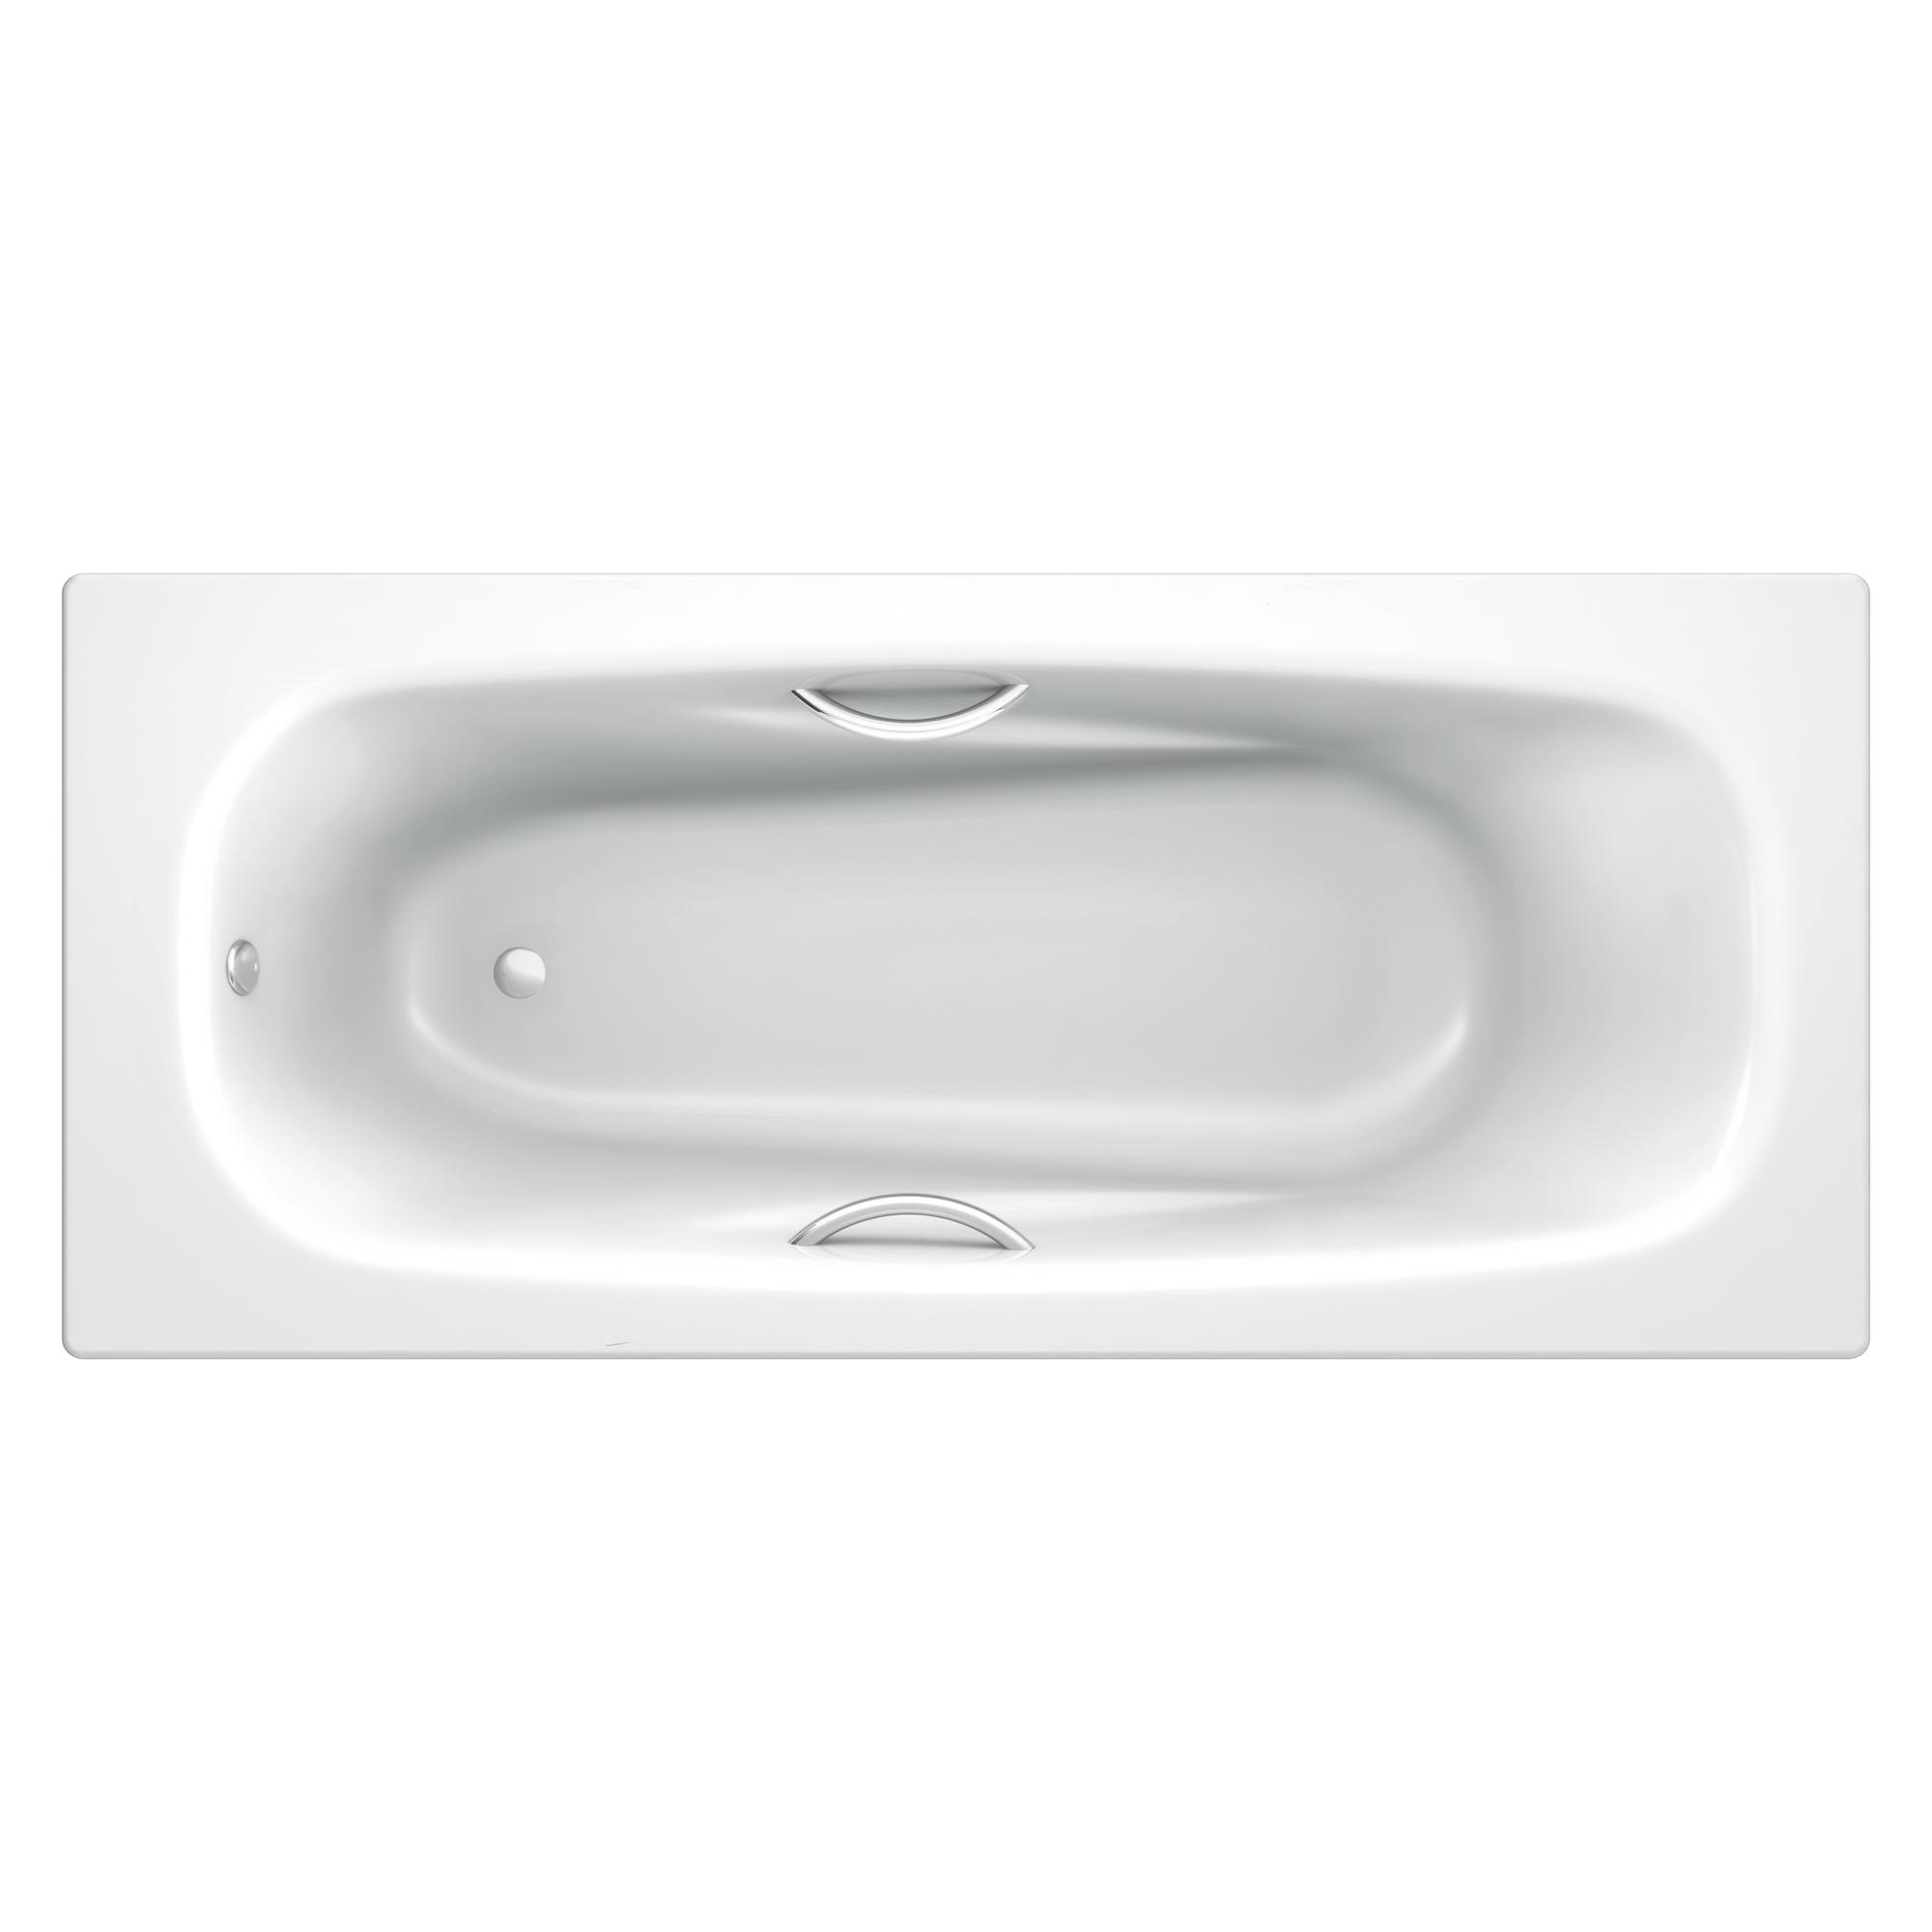 Стальная ванна Koller Pool Deline 150х75 с отв под ручки ванна акриловая jika floreana 150х75